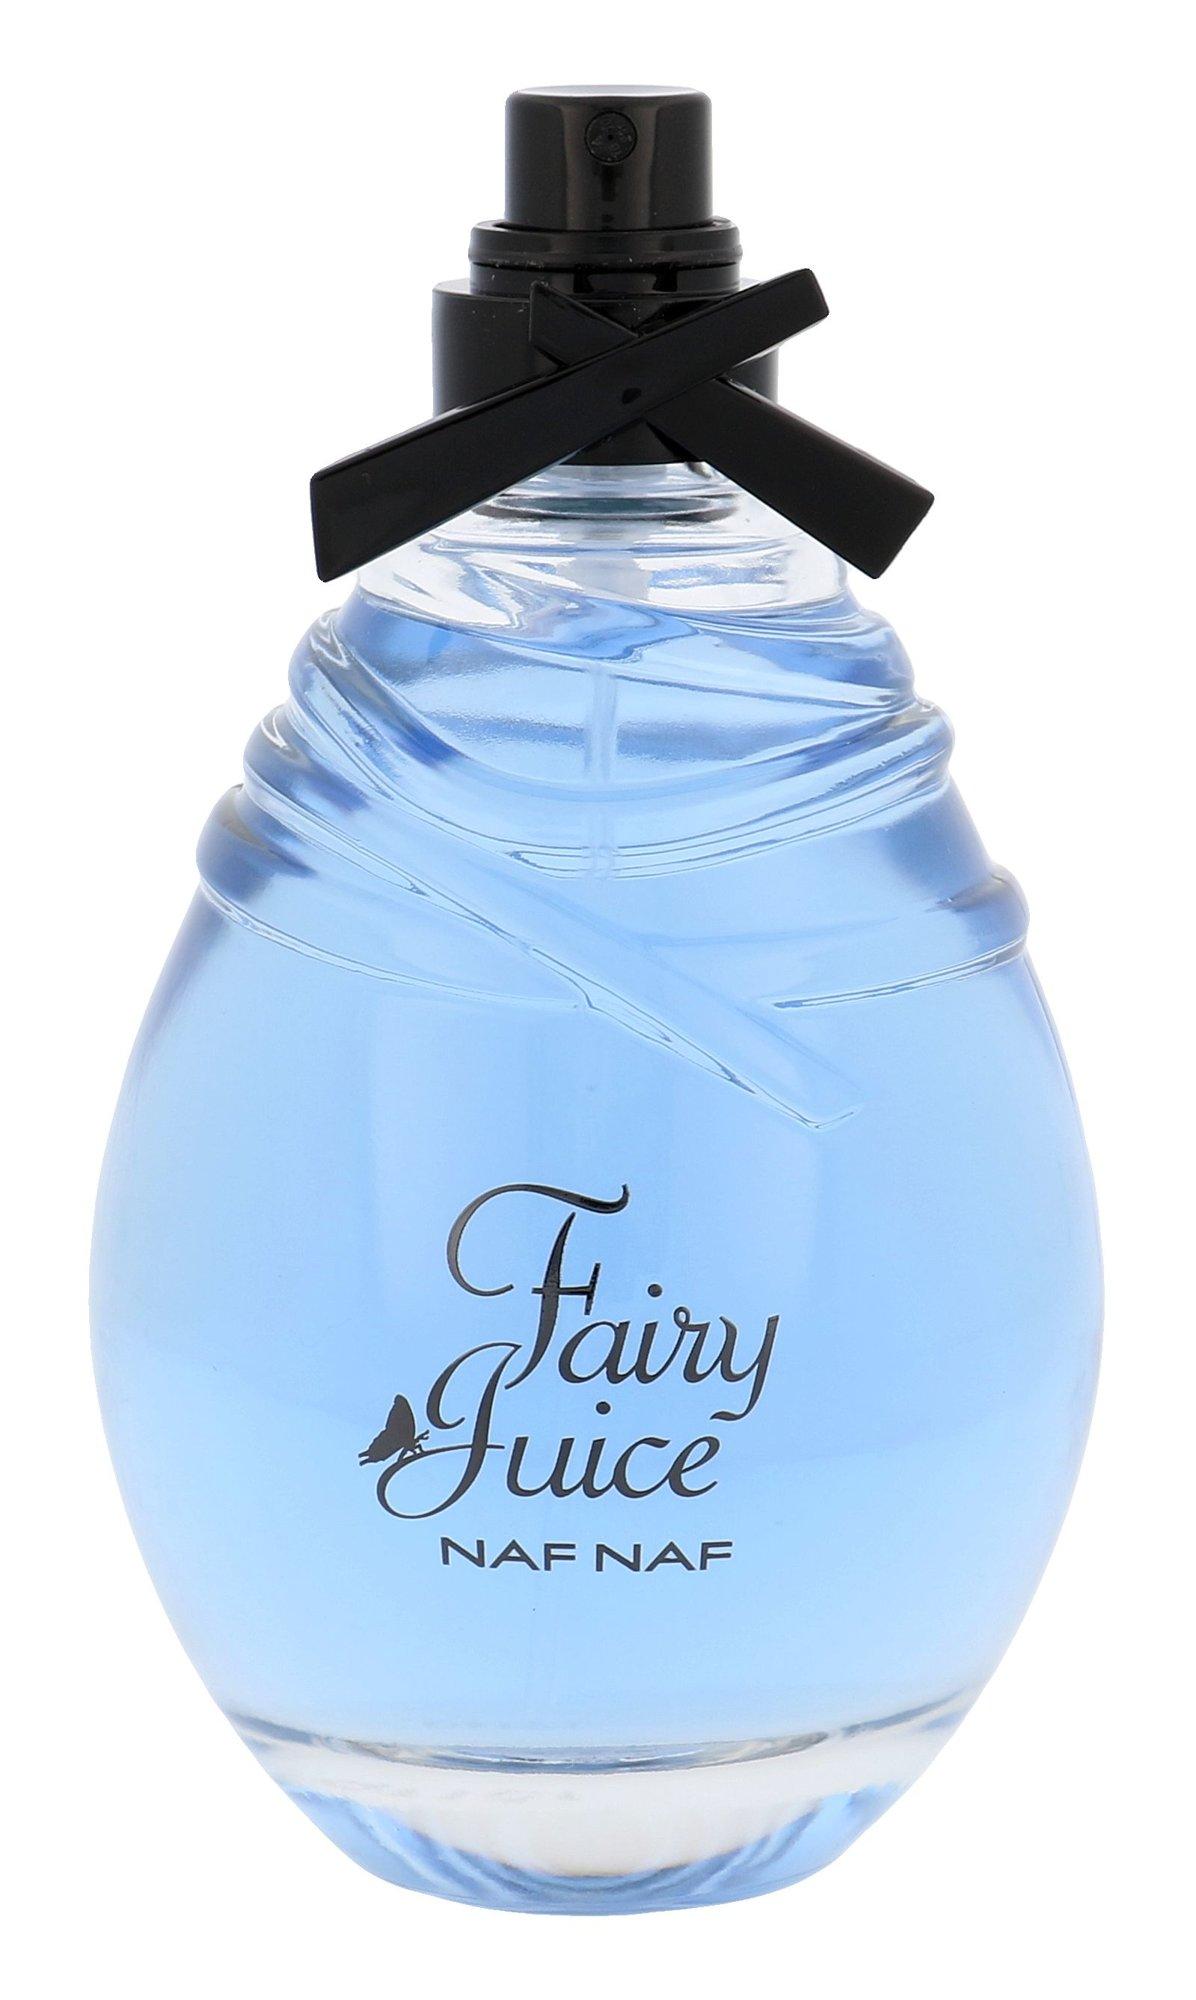 NAFNAF Fairy Juice Blue EDT 100ml